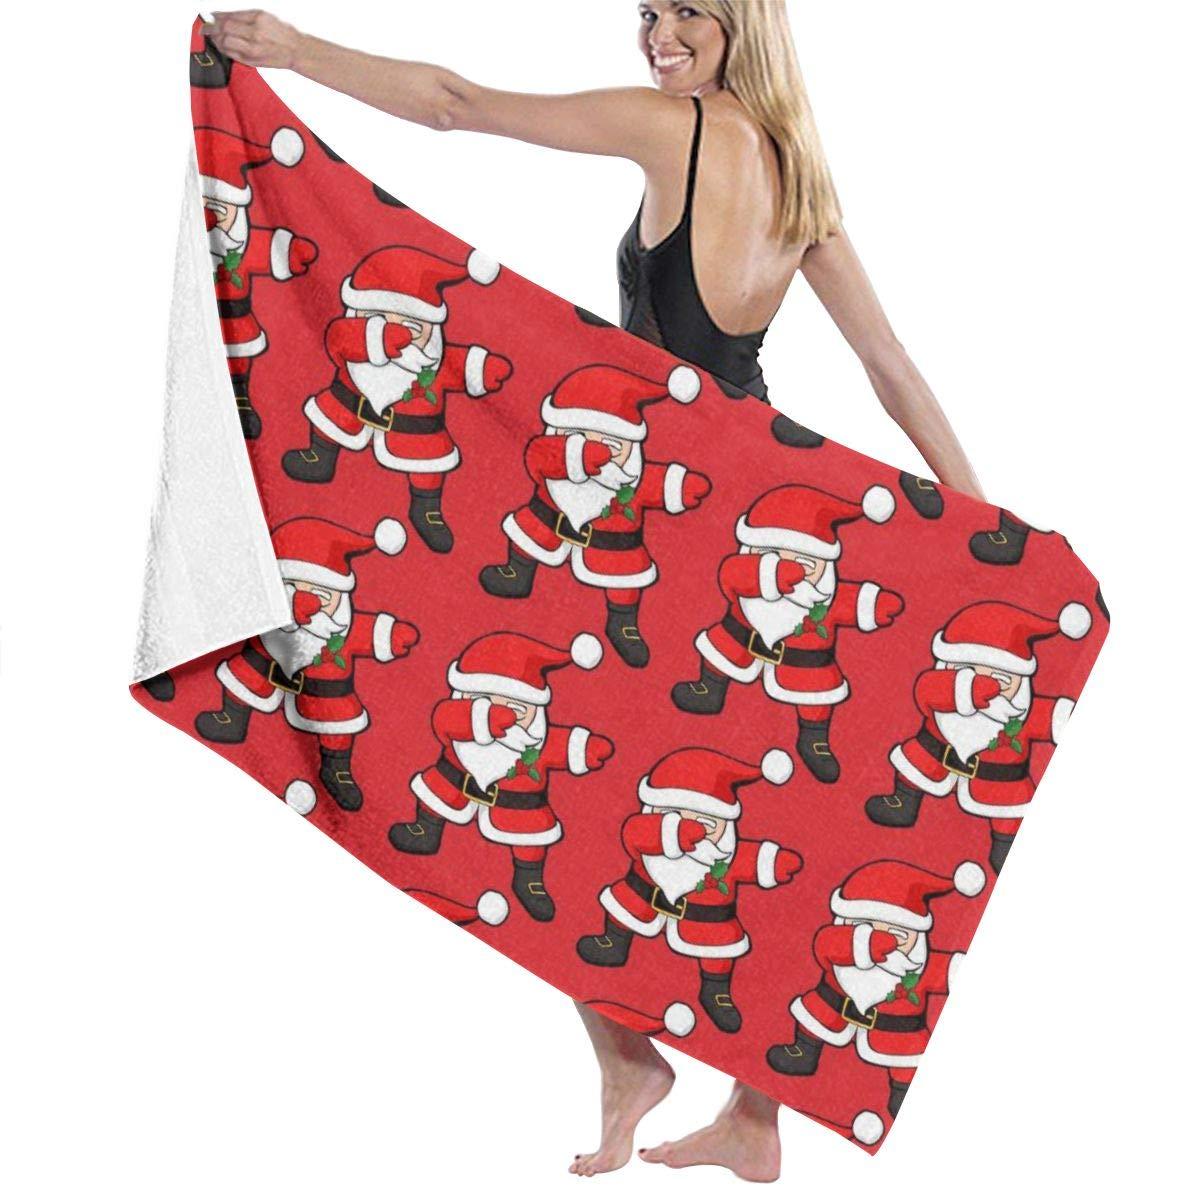 INWANZI 32'' x 51'' Oversized Luxury Bath Towels, Super Soft Highly Absorbent Quick Dry for Bathroom/Shower/Gym/Fitness/Yoga/Sports - Funny Santa Claus Christmas Dab Bath Sheet